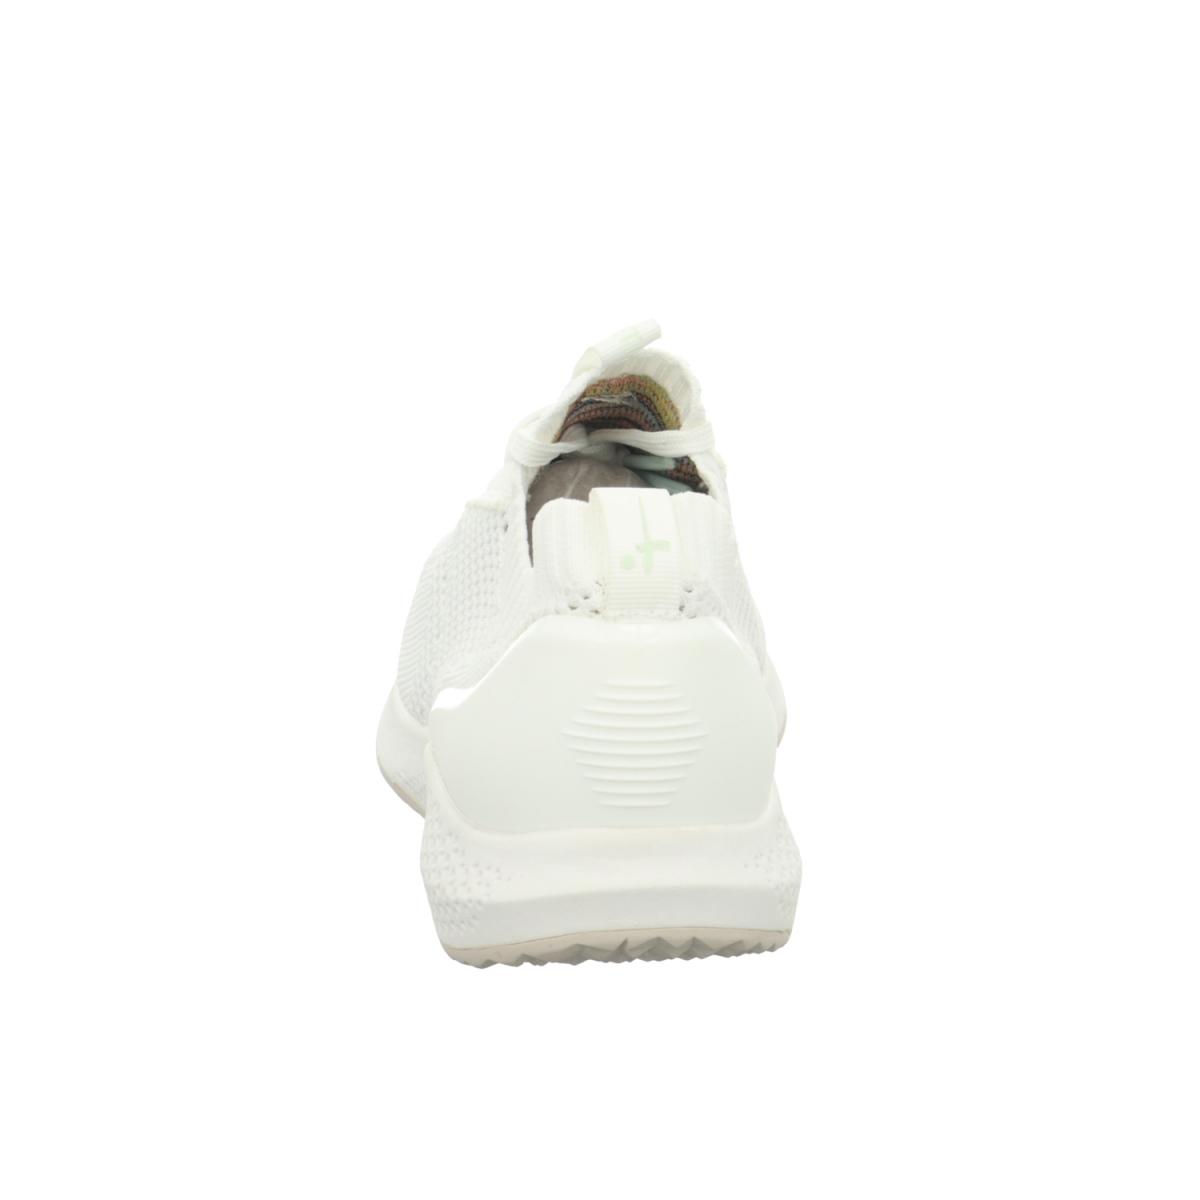 a90d5b128ddcdc ... Tamaris - Sneaker ...